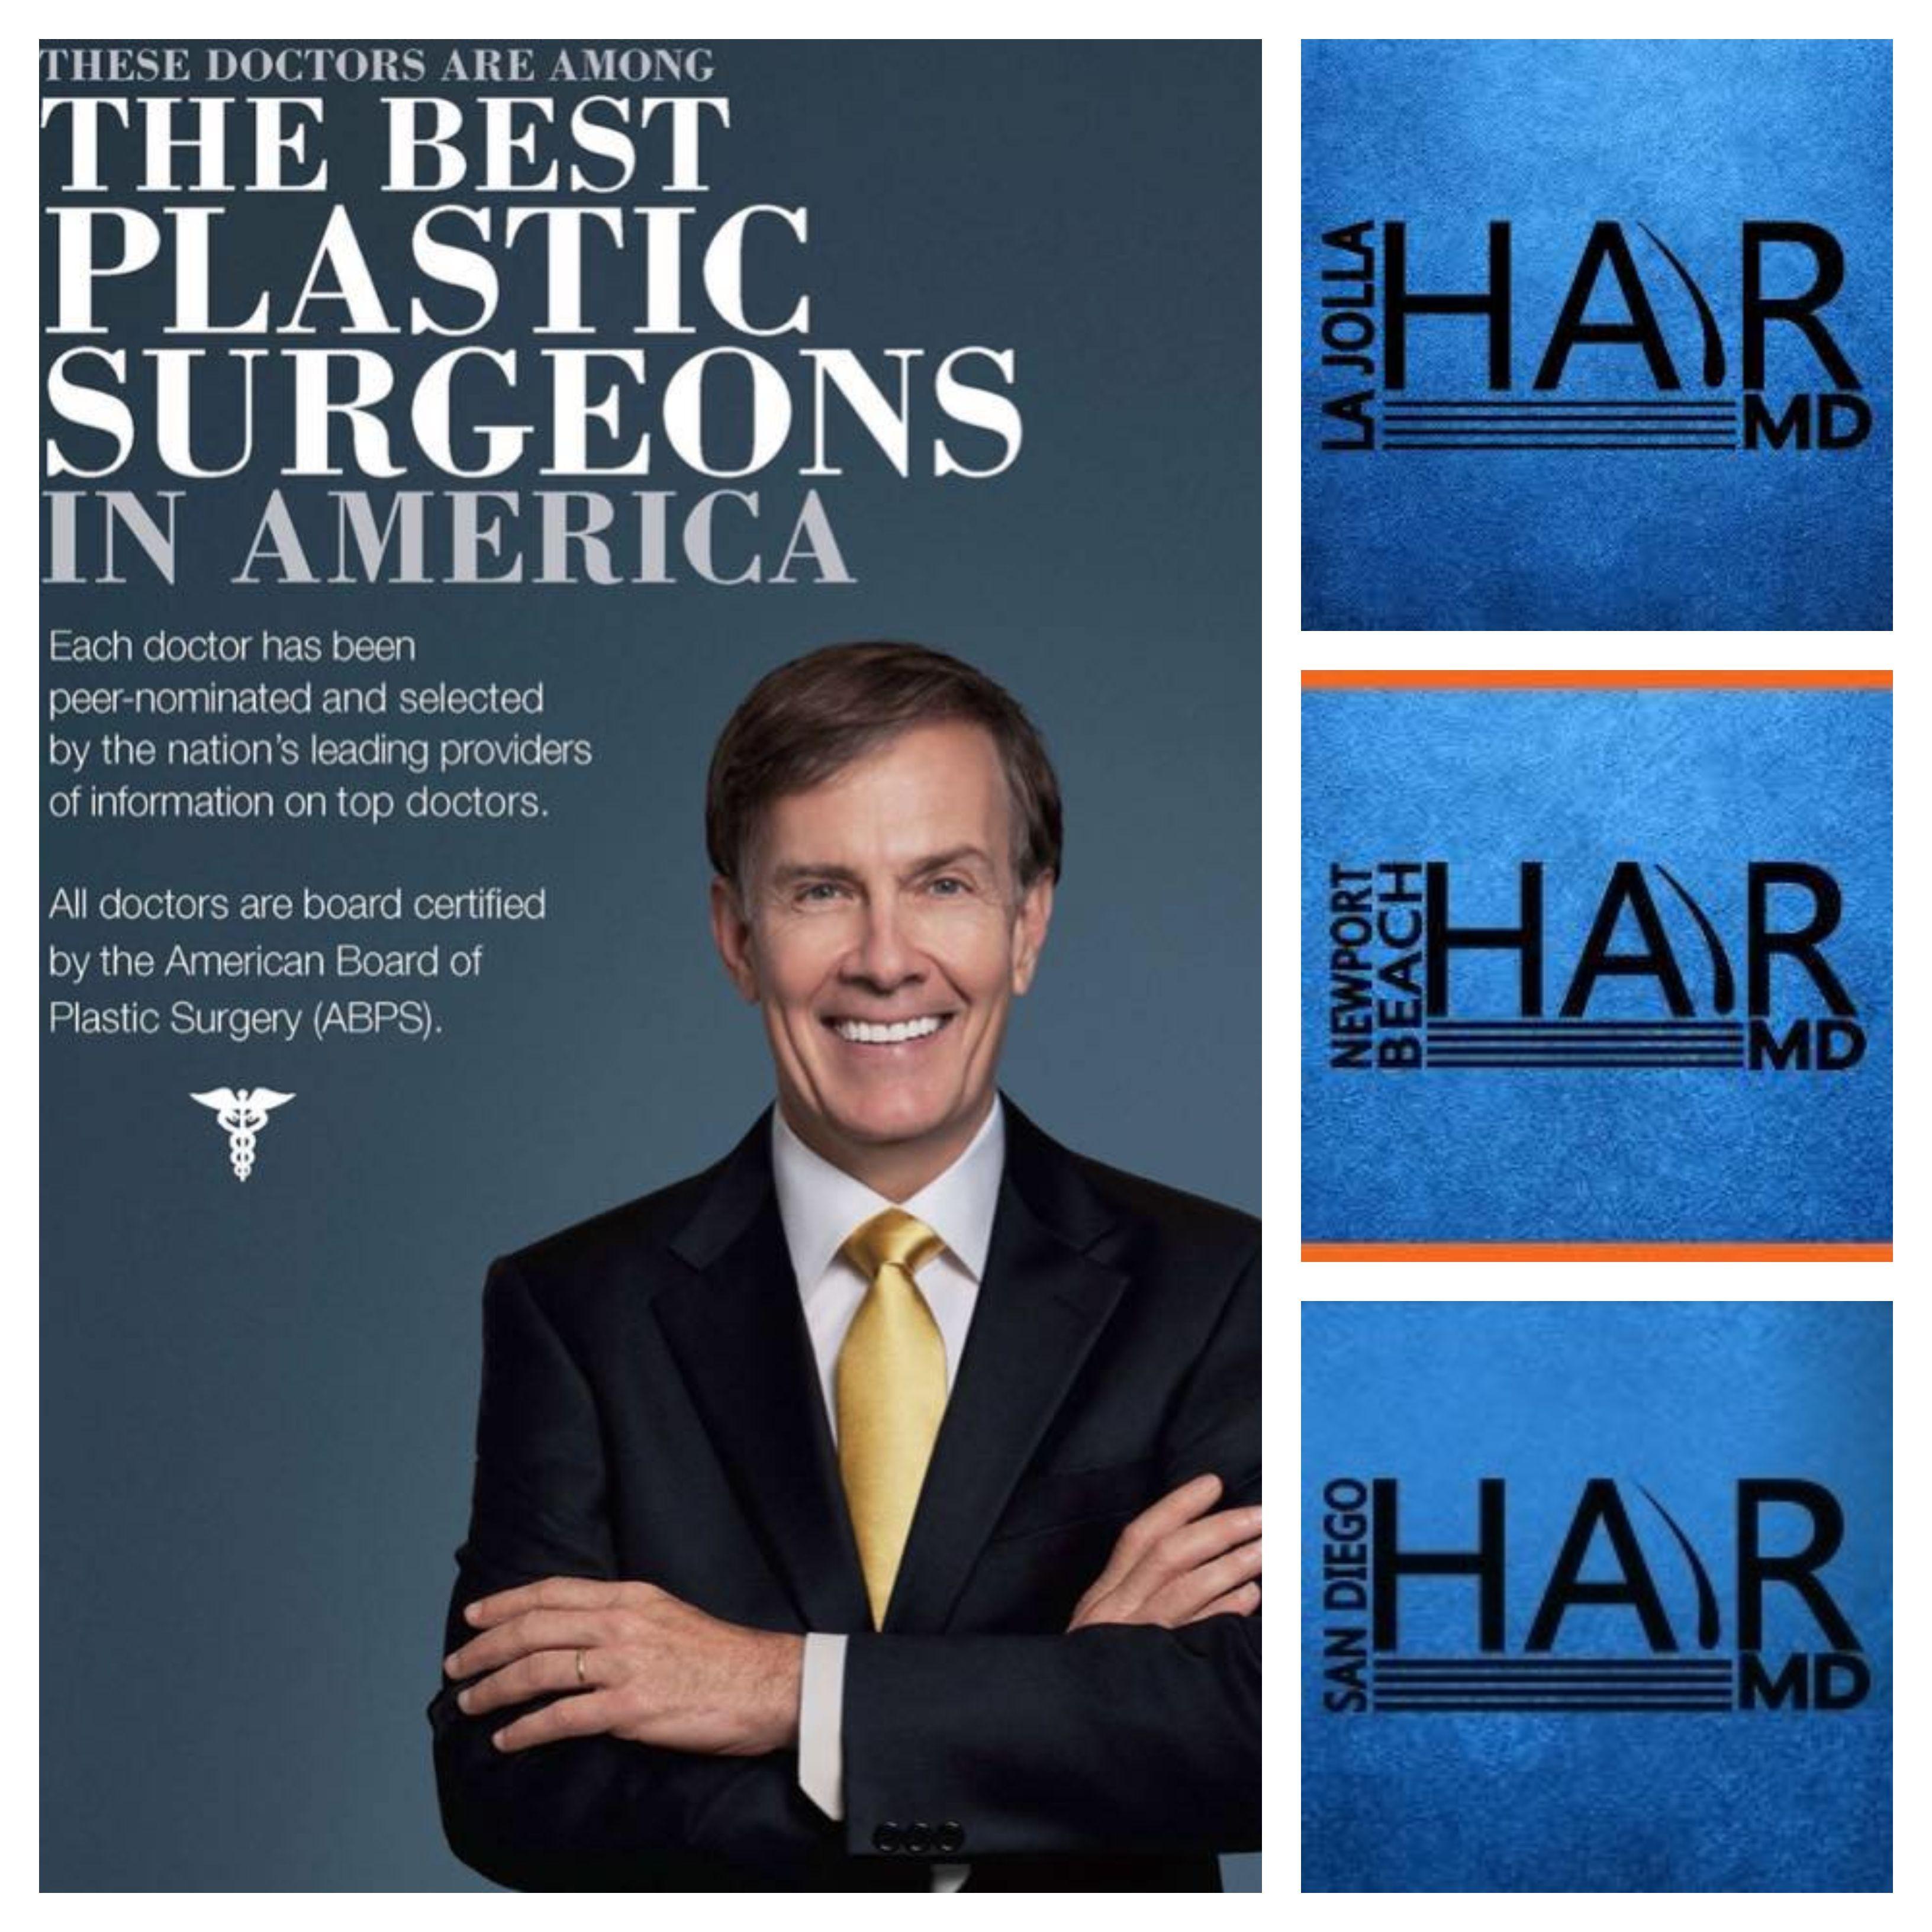 The Best Plastic Surgeon Best Plastic Surgeons Plastic Surgeon Plastic Surgery